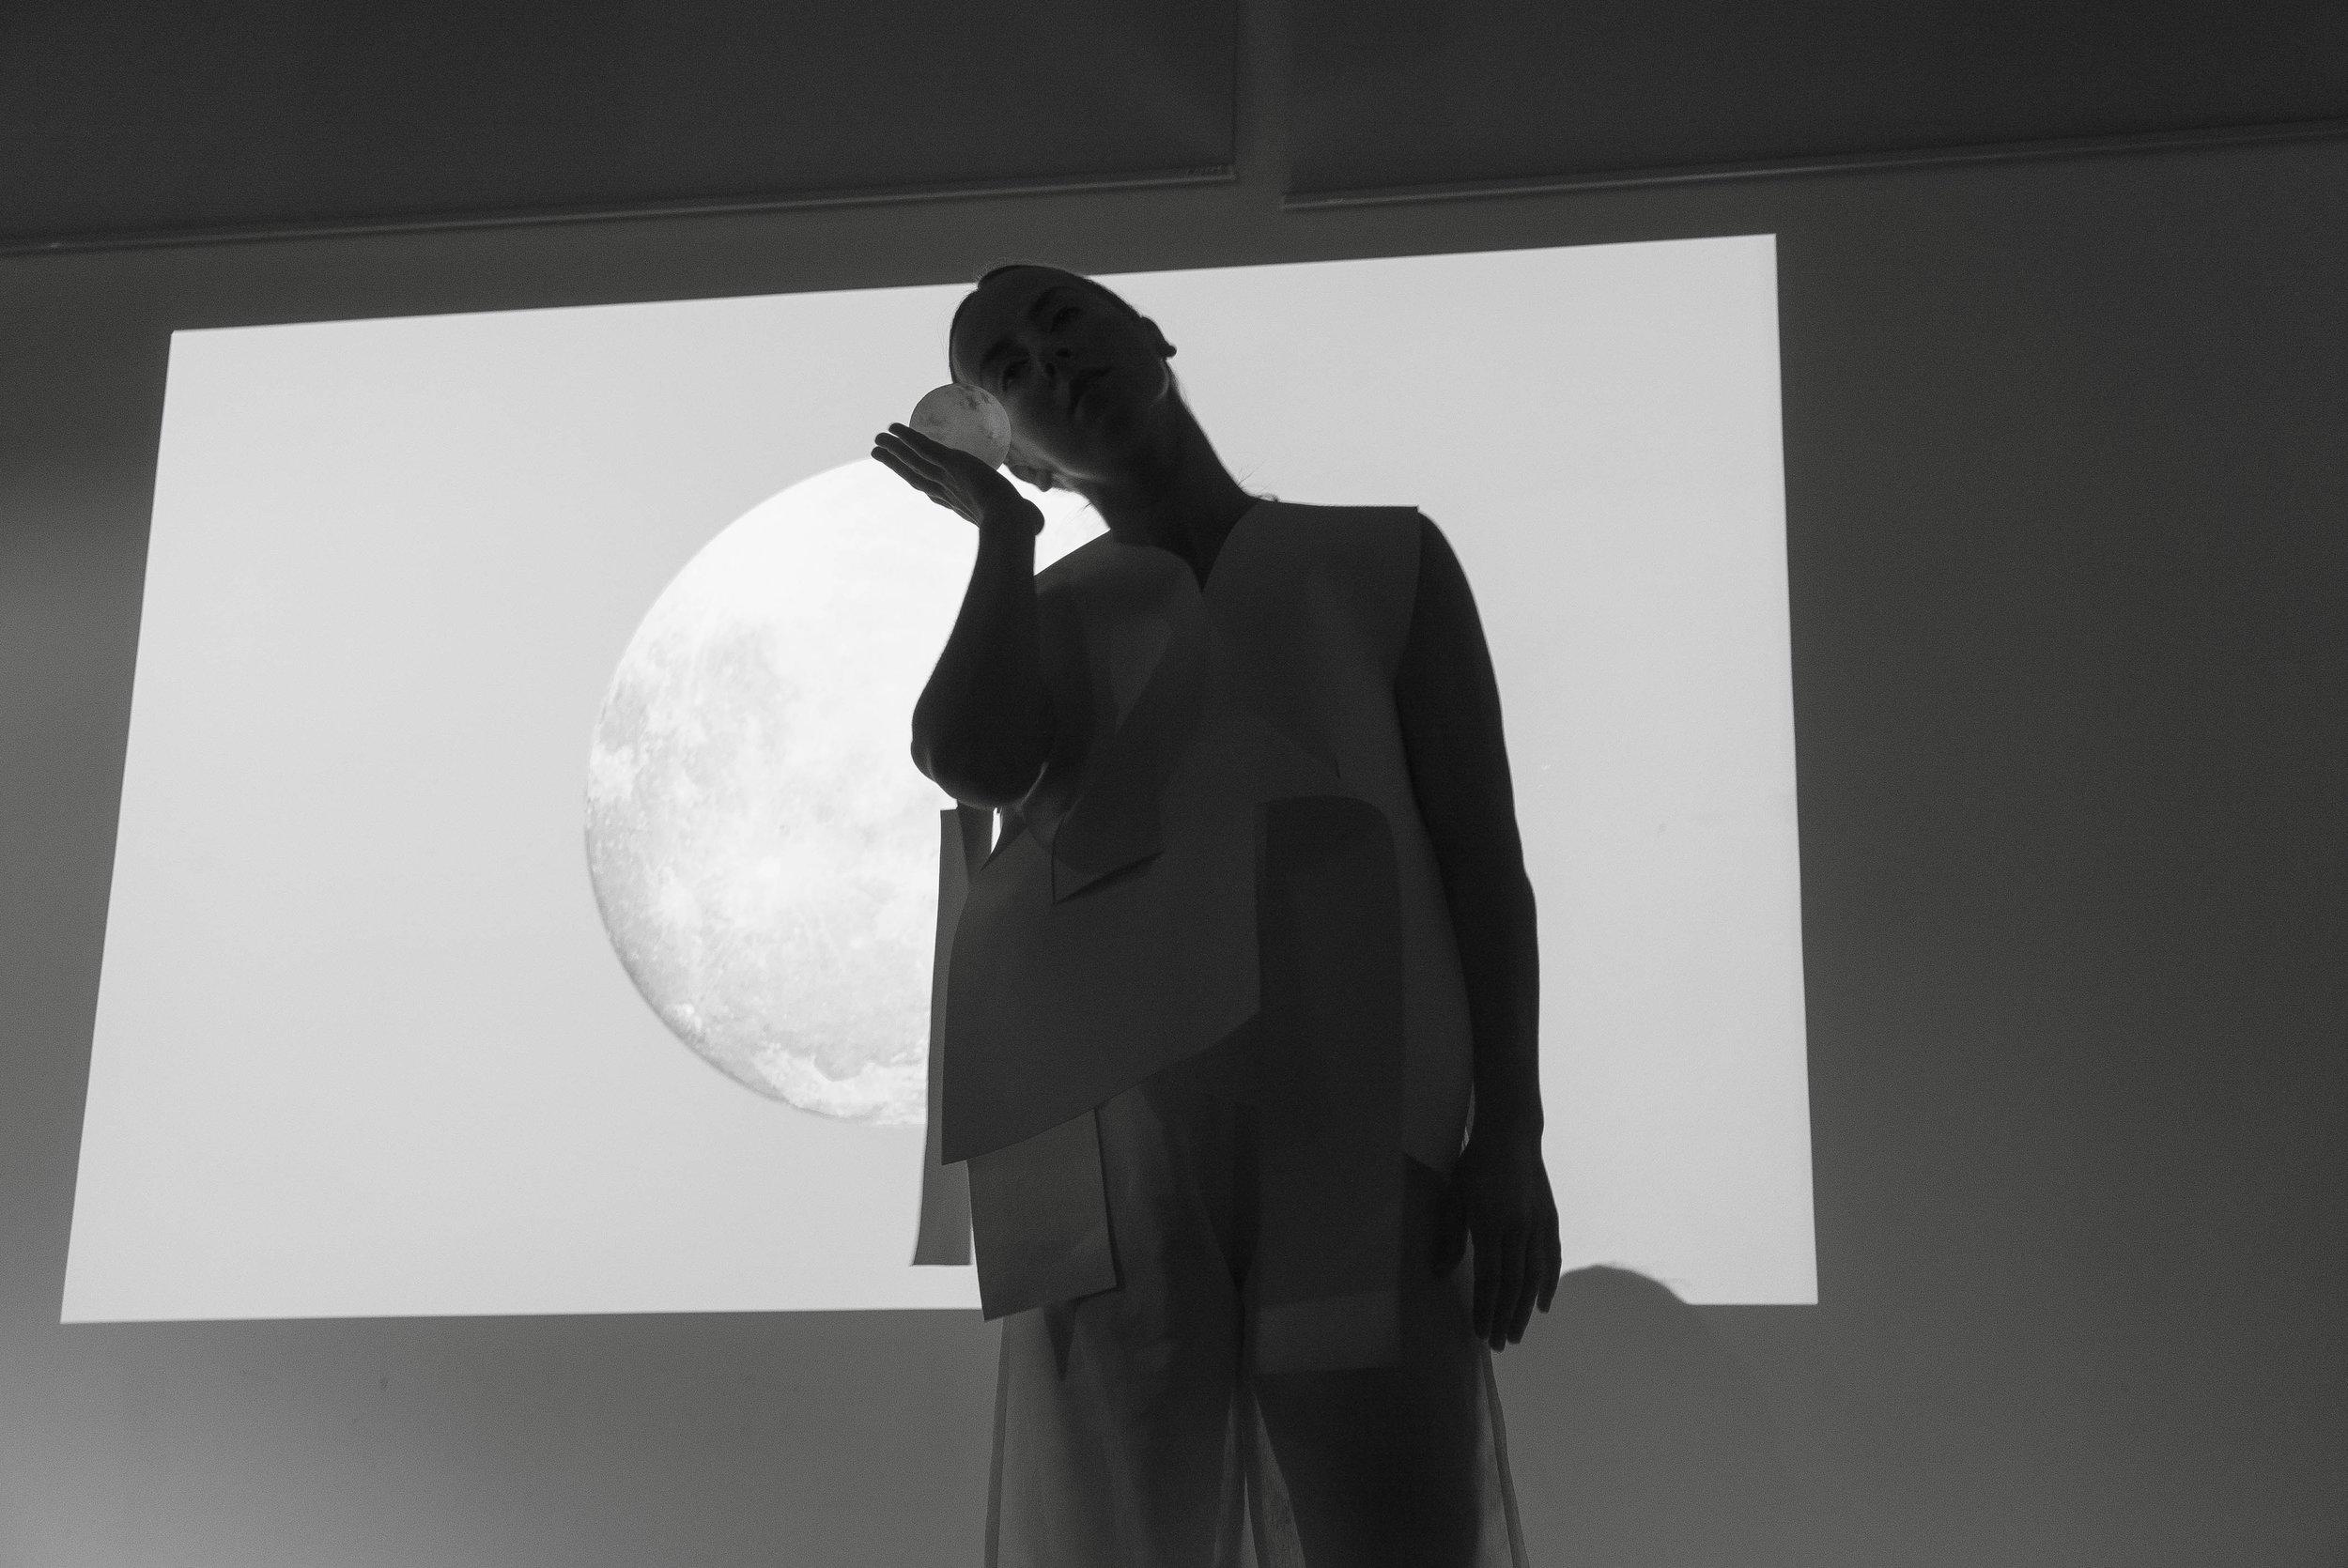 lieu-le-måne-oslo-ldthphotography-06.jpg